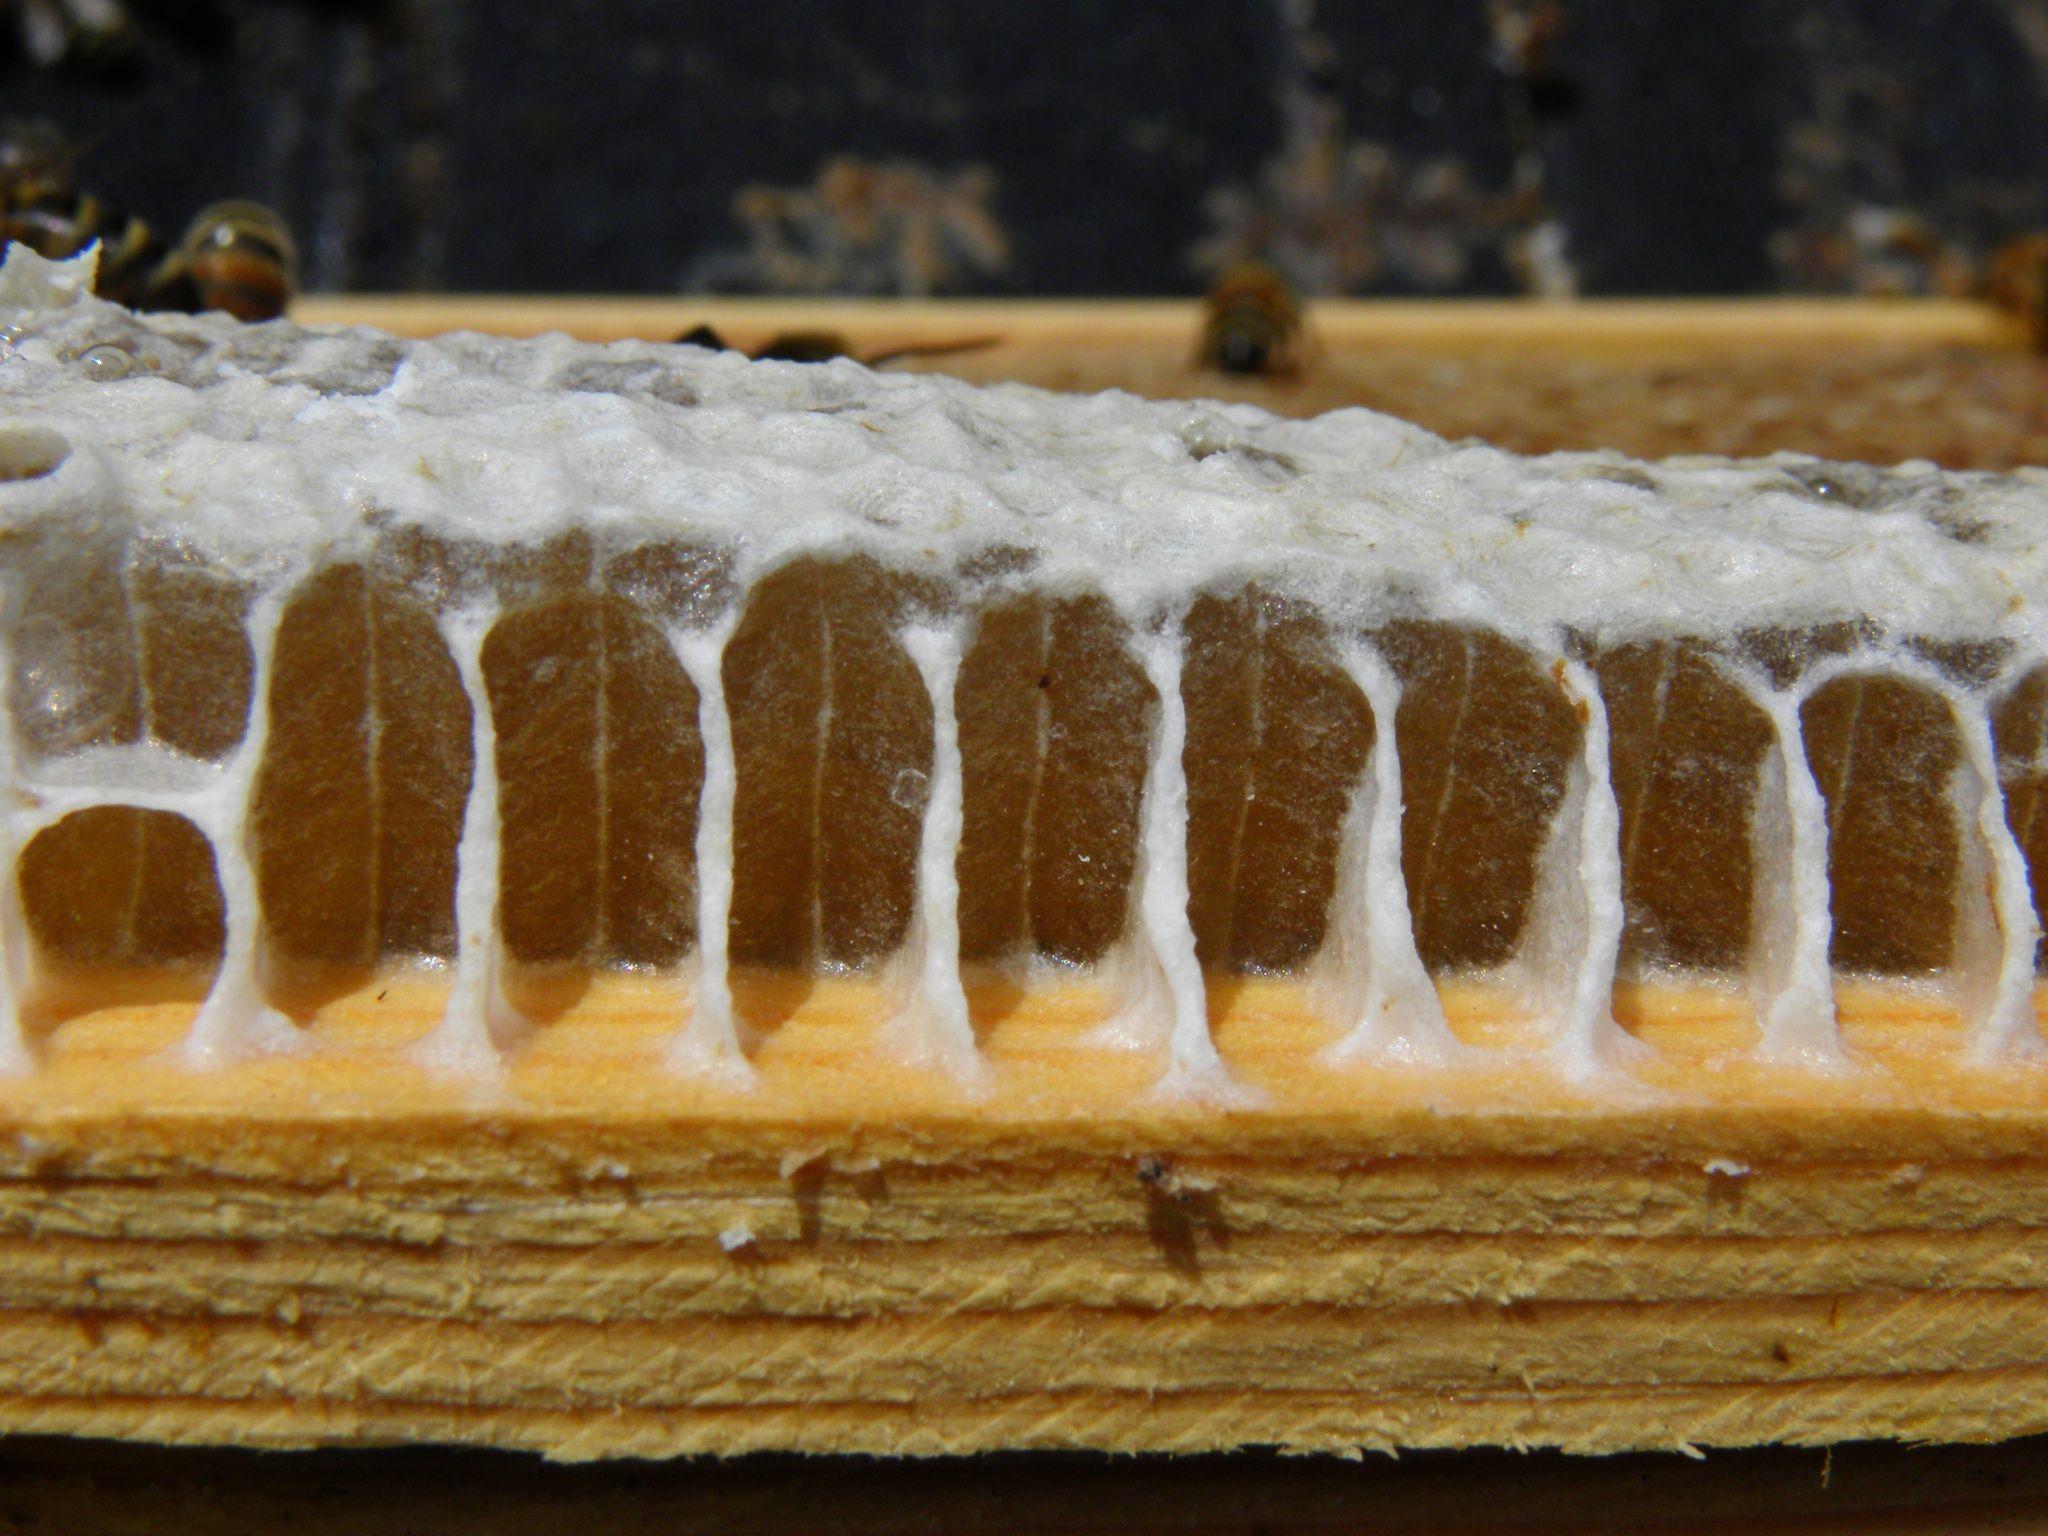 Pin by jake yarish on what do honeybees do